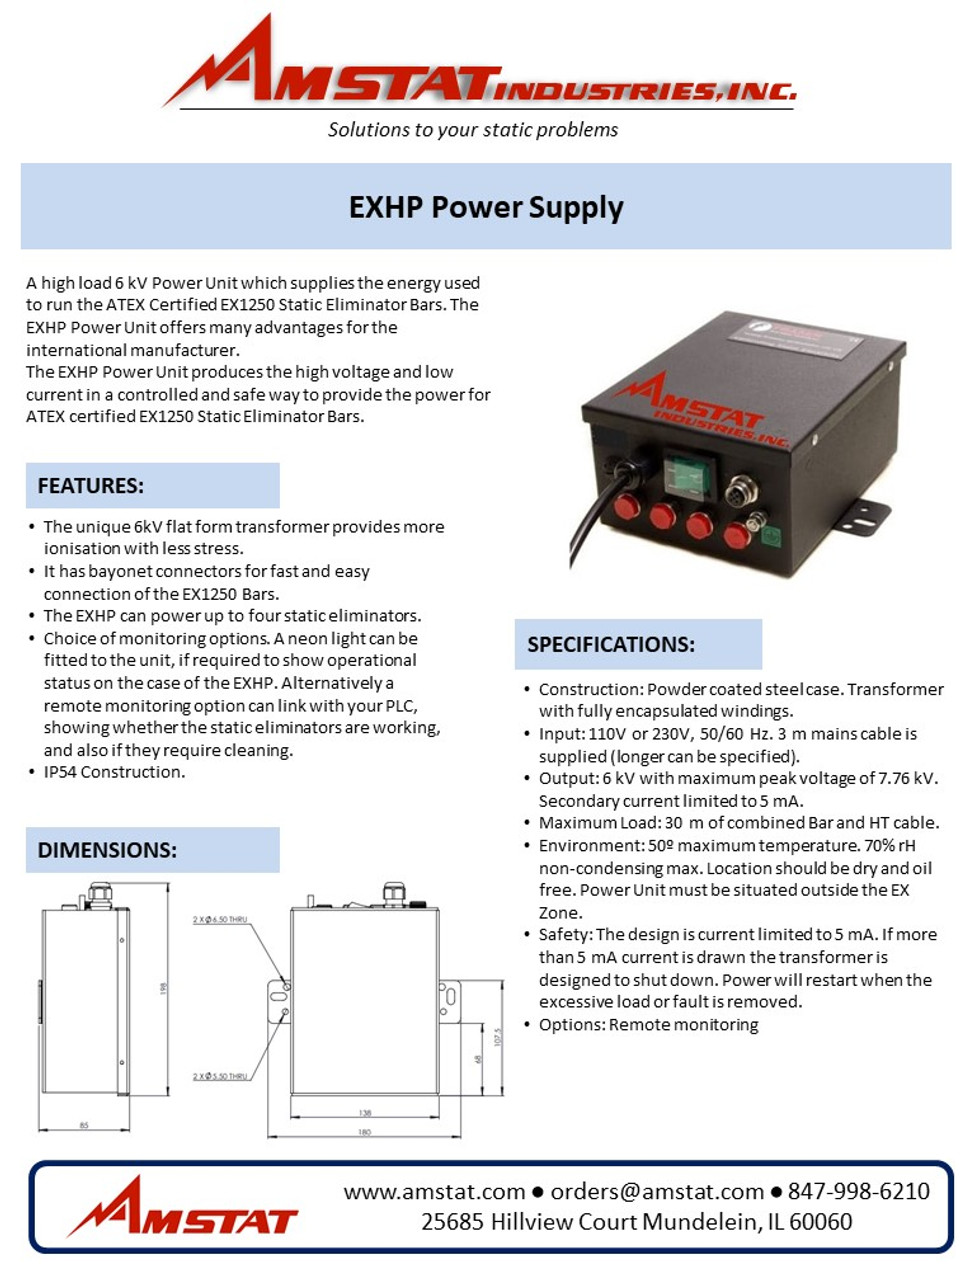 EXHP Power Supply